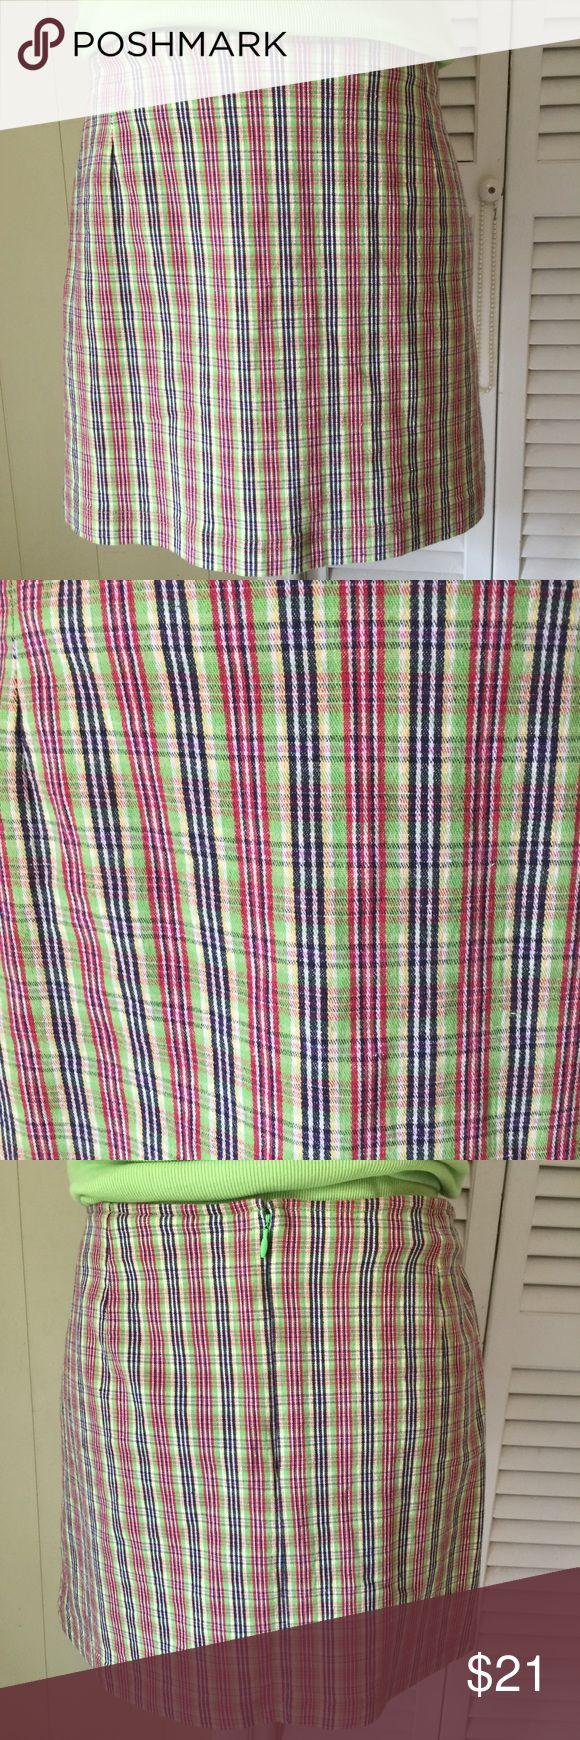 "Quizz Stretch Skirt Size XL Nice little stretchy skirt and a beautiful design.  Back zipper and eye hook.  EUC  Waist:  36"" Length:  15"" Quizz Stretch Skirts Mini"